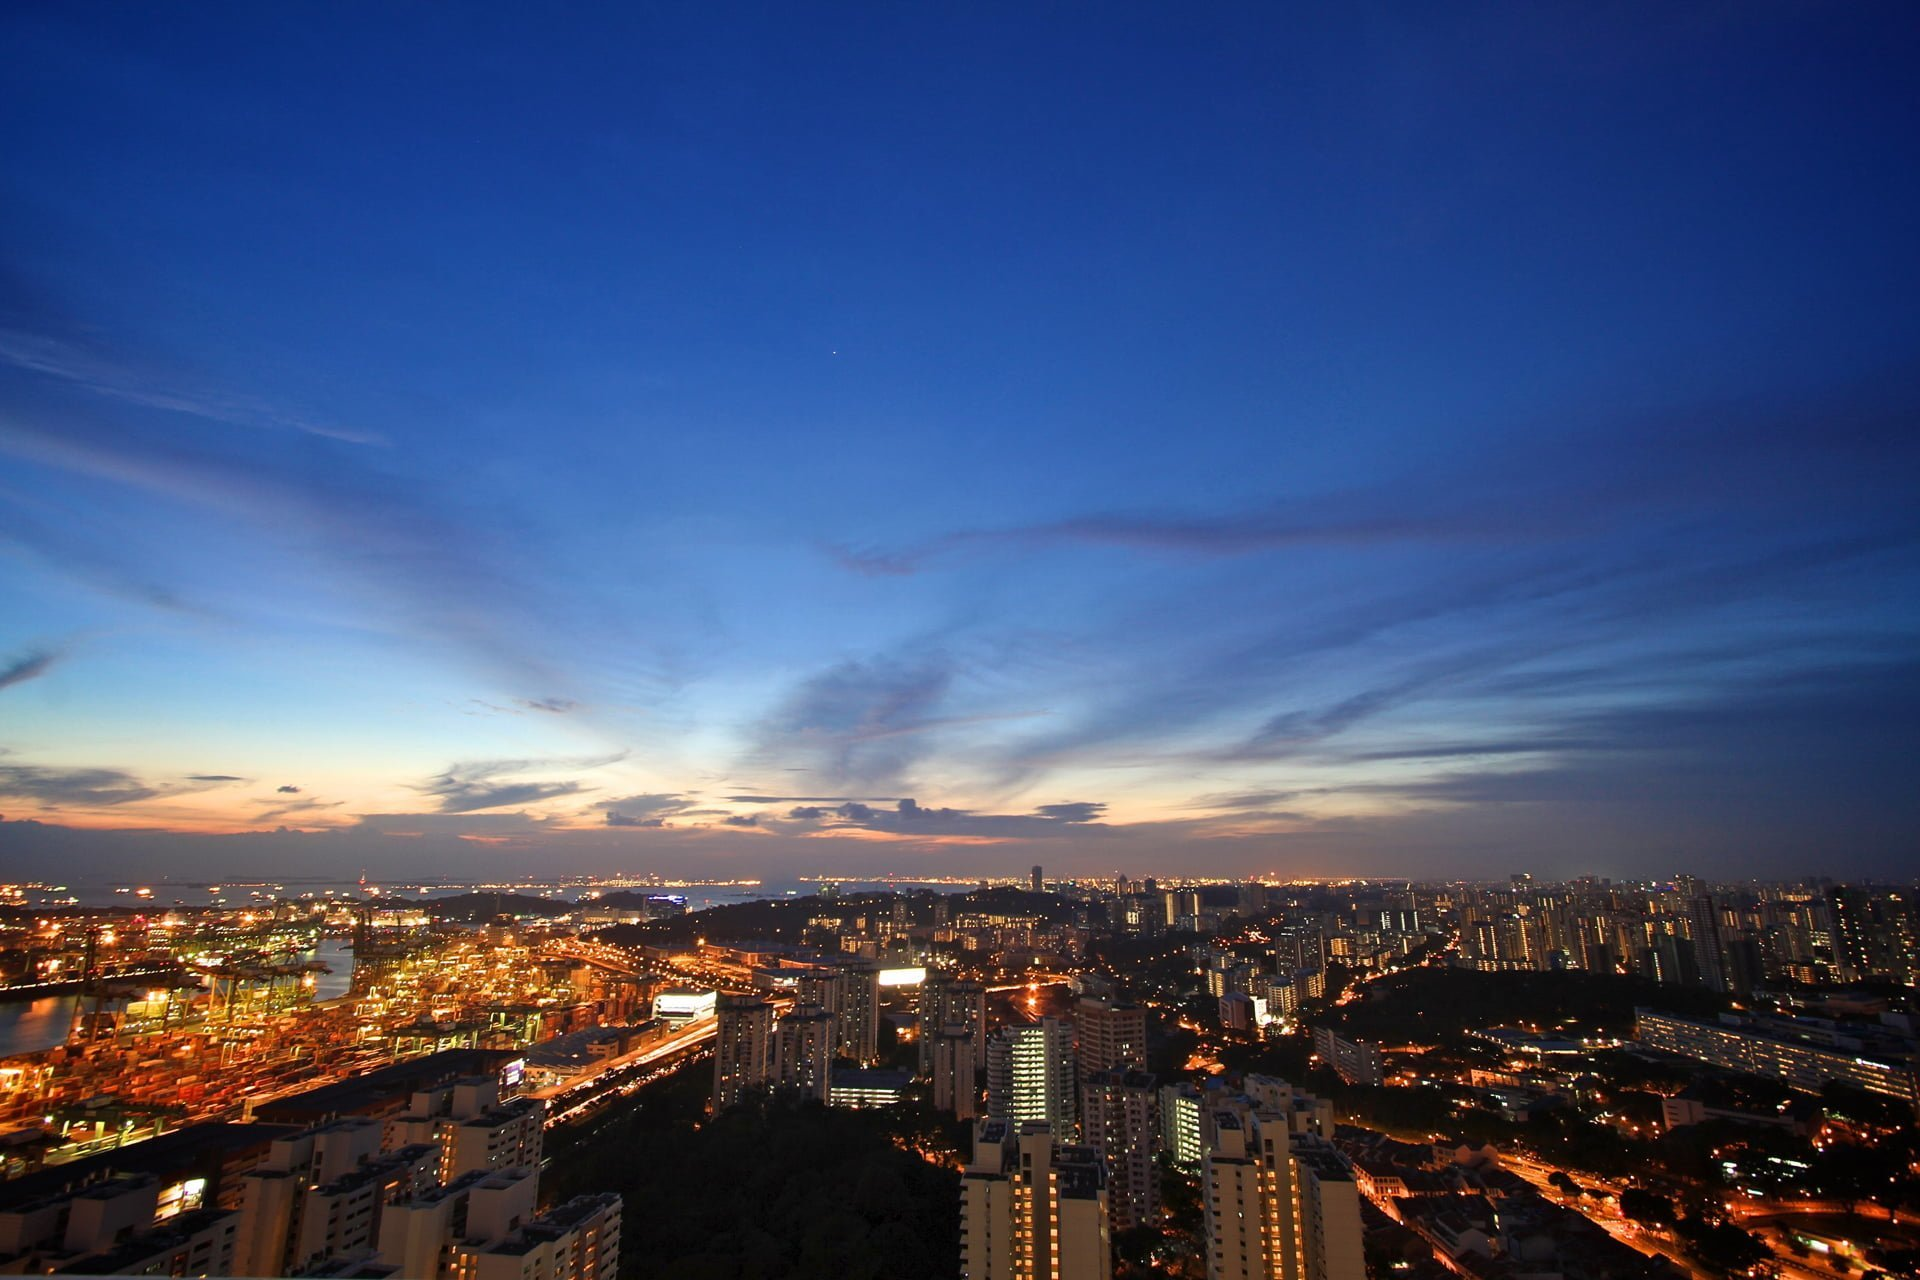 singapur manzarası